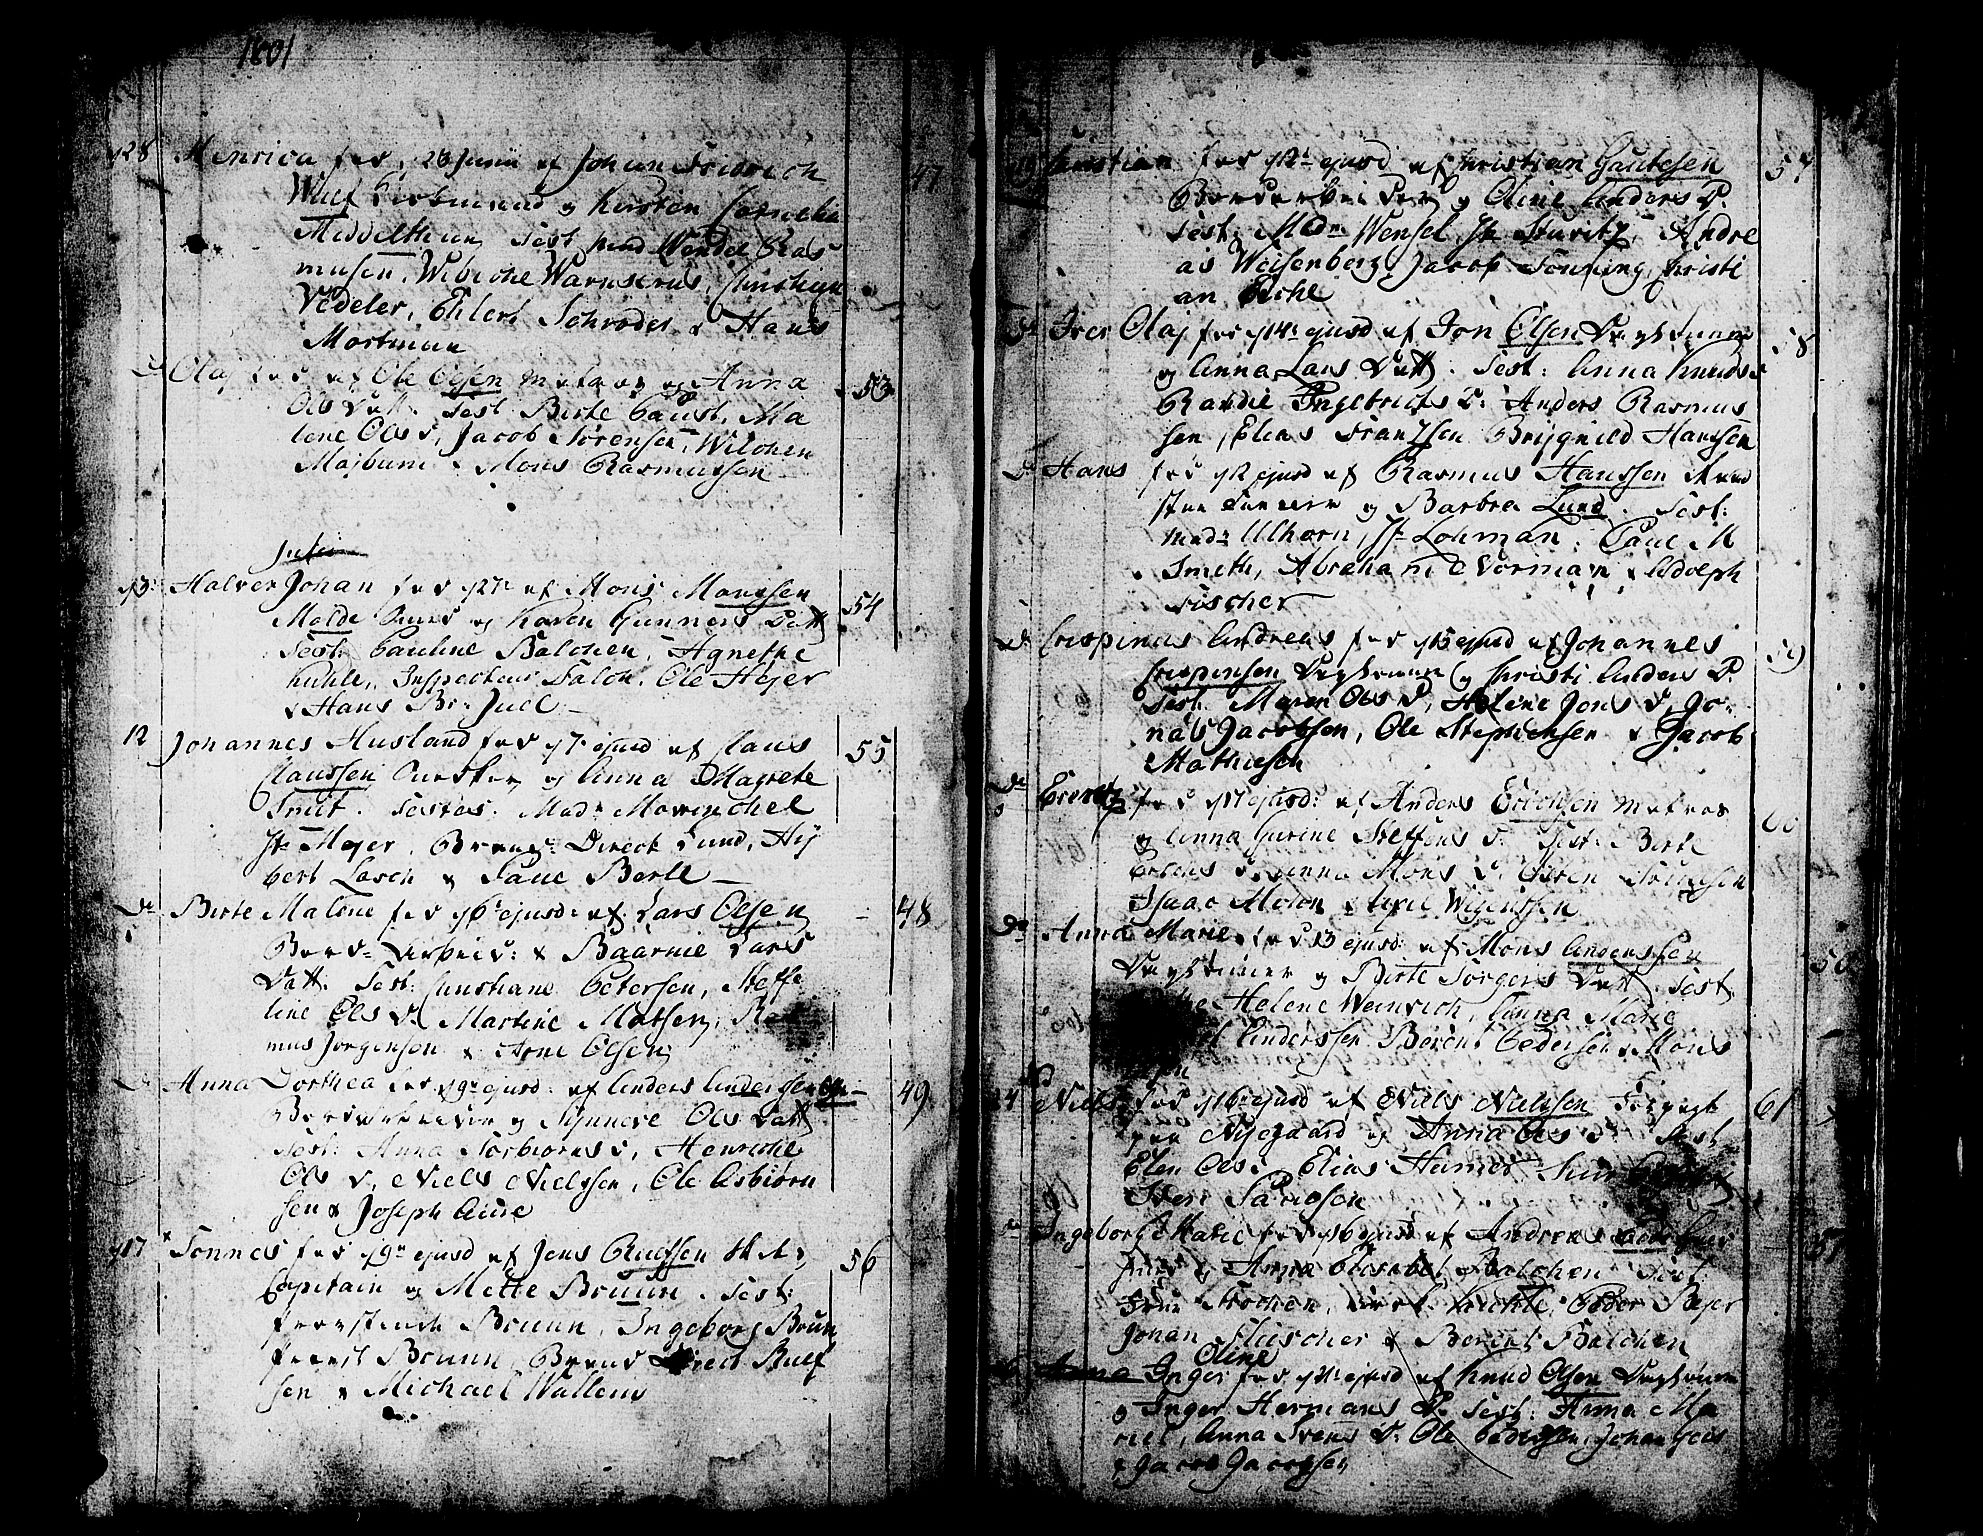 SAB, Domkirken sokneprestembete, H/Haa/L0004: Ministerialbok nr. A 4, 1763-1820, s. 256-257